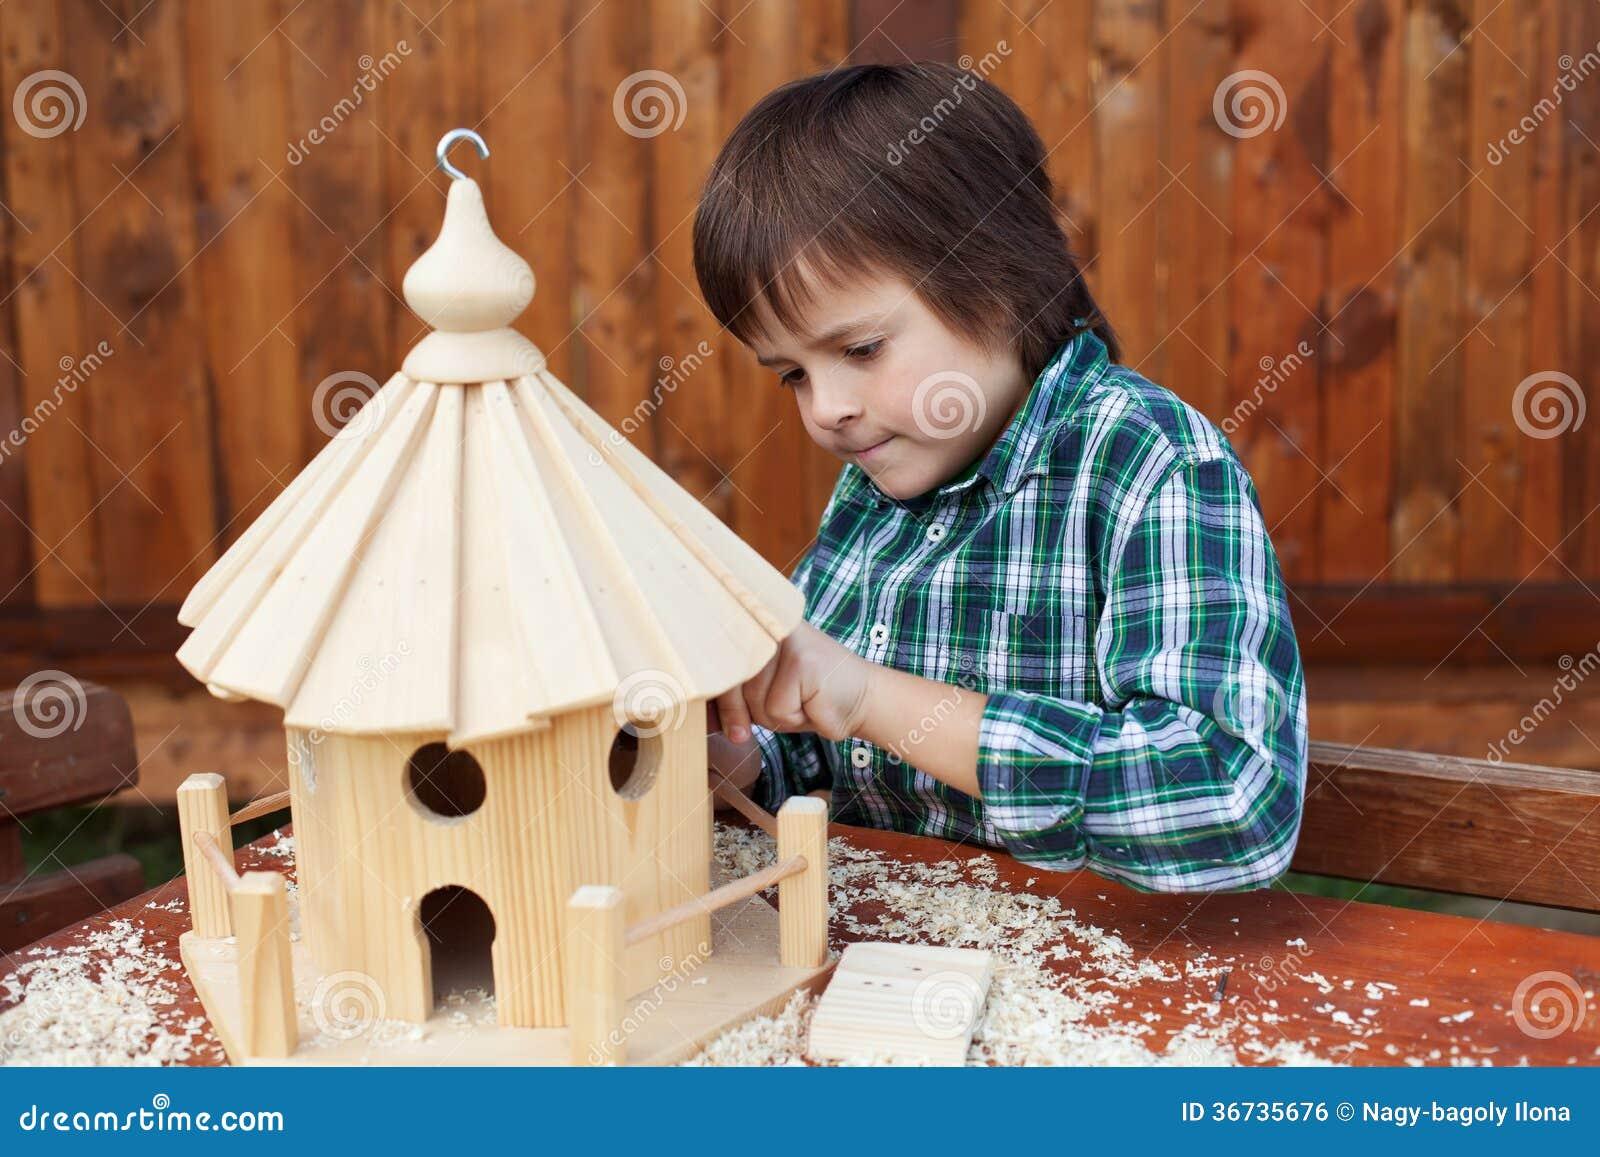 Burd House Building For Kids